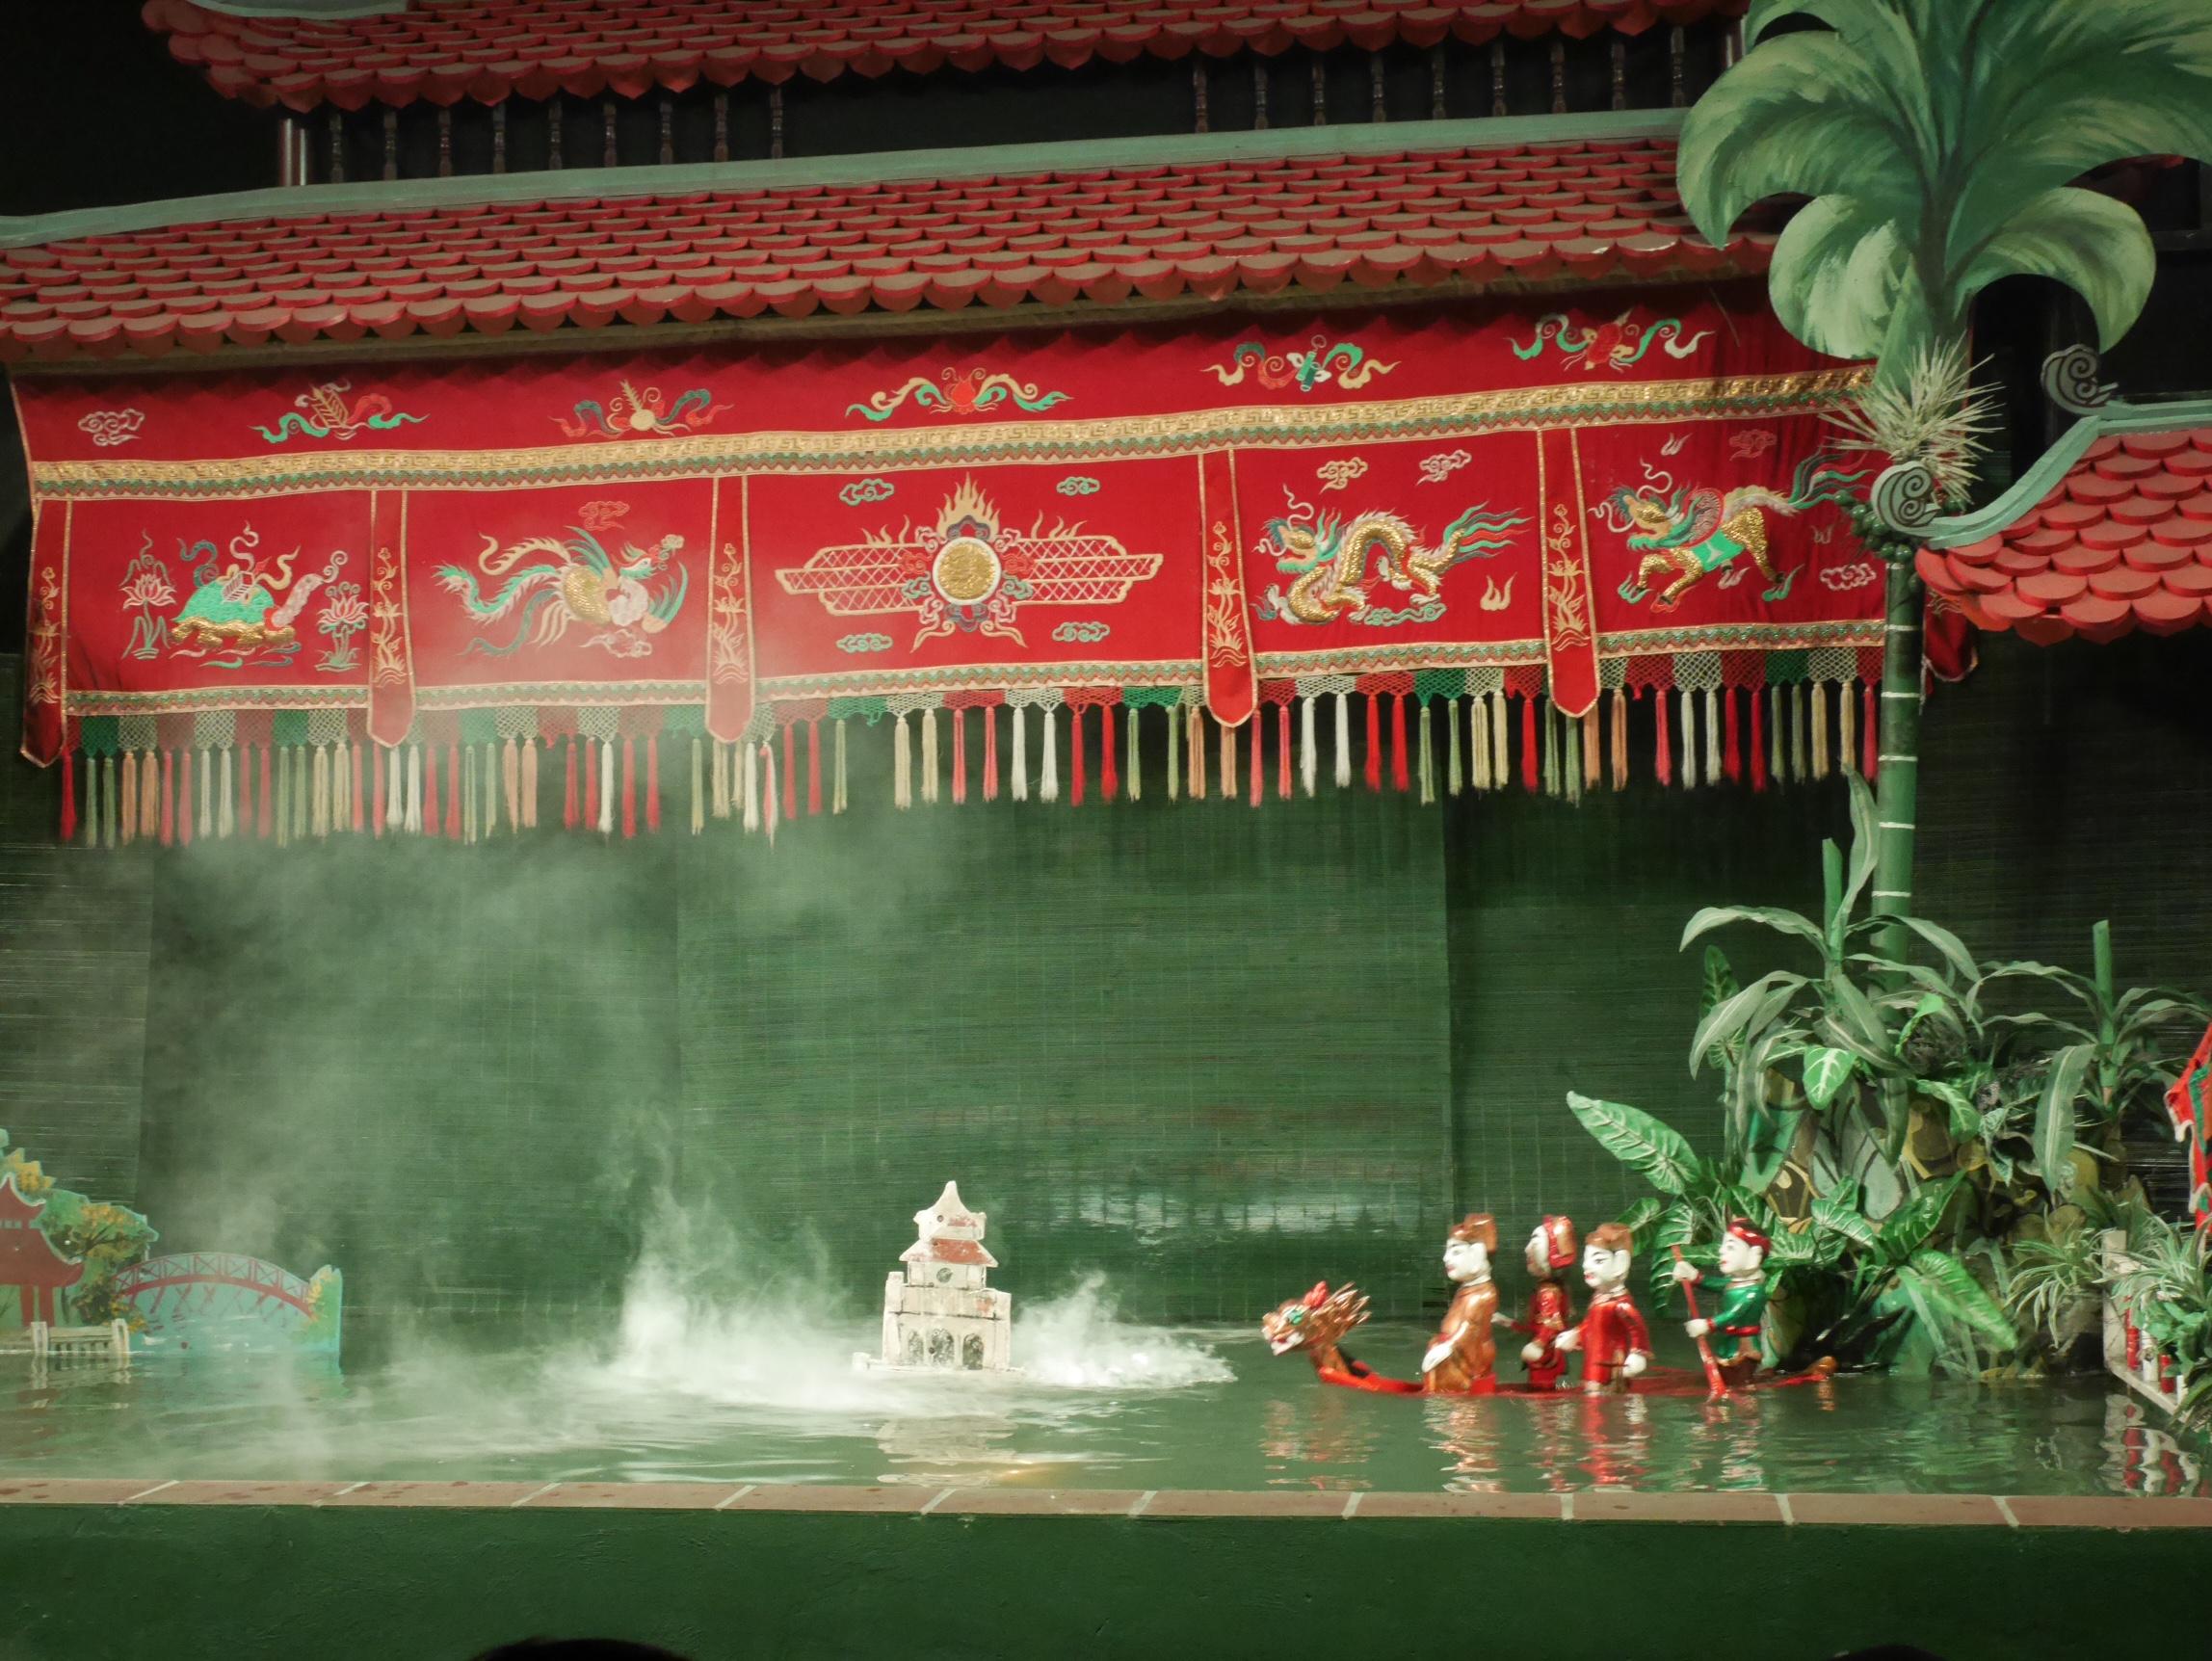 returning the sword to Hoan Kiem Lake